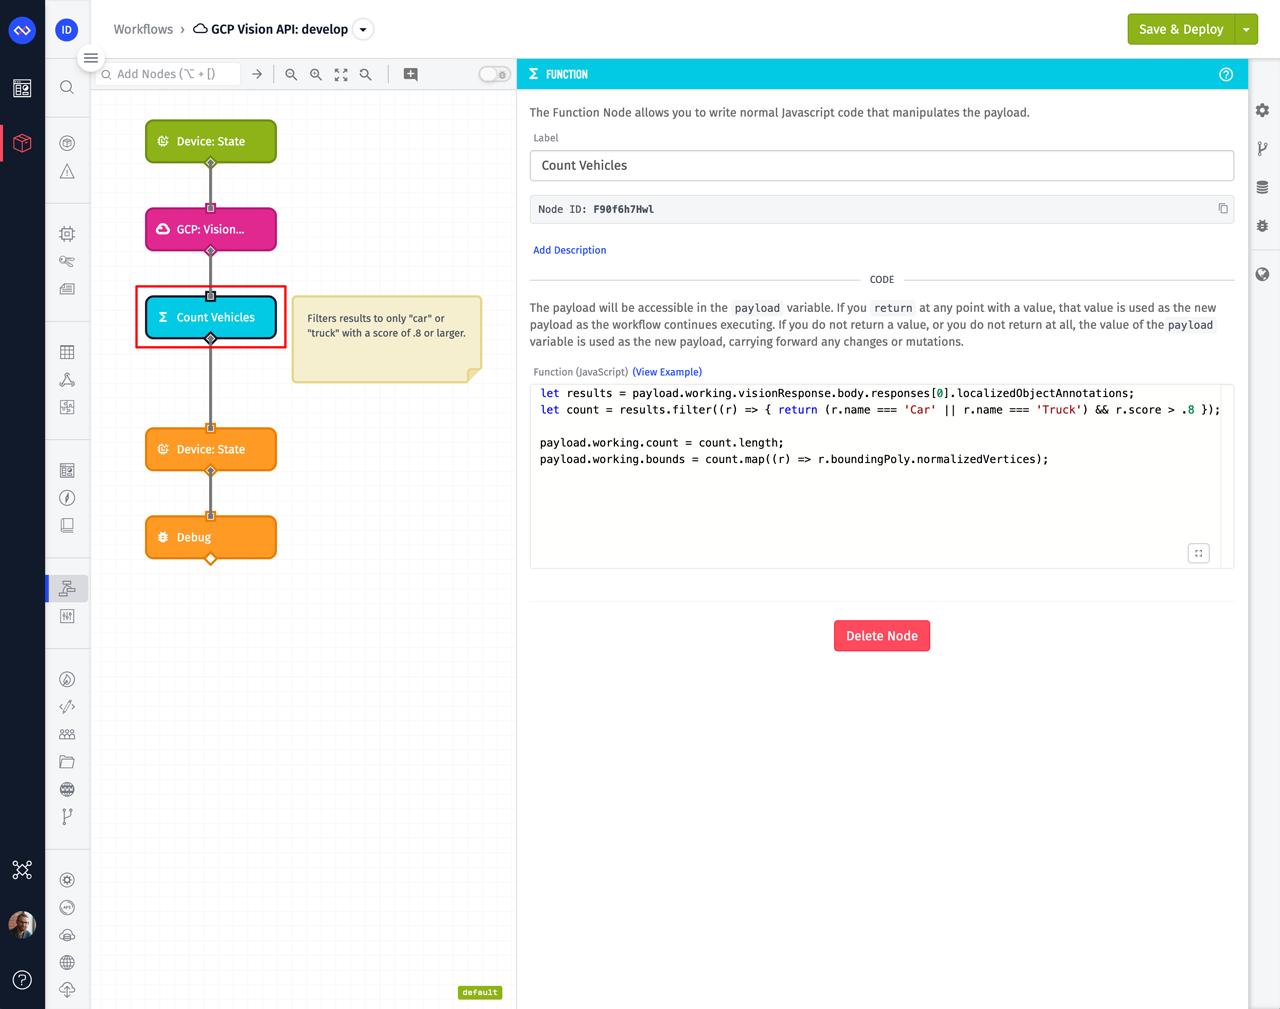 Losant Function Node Filtering Google Vision API Results